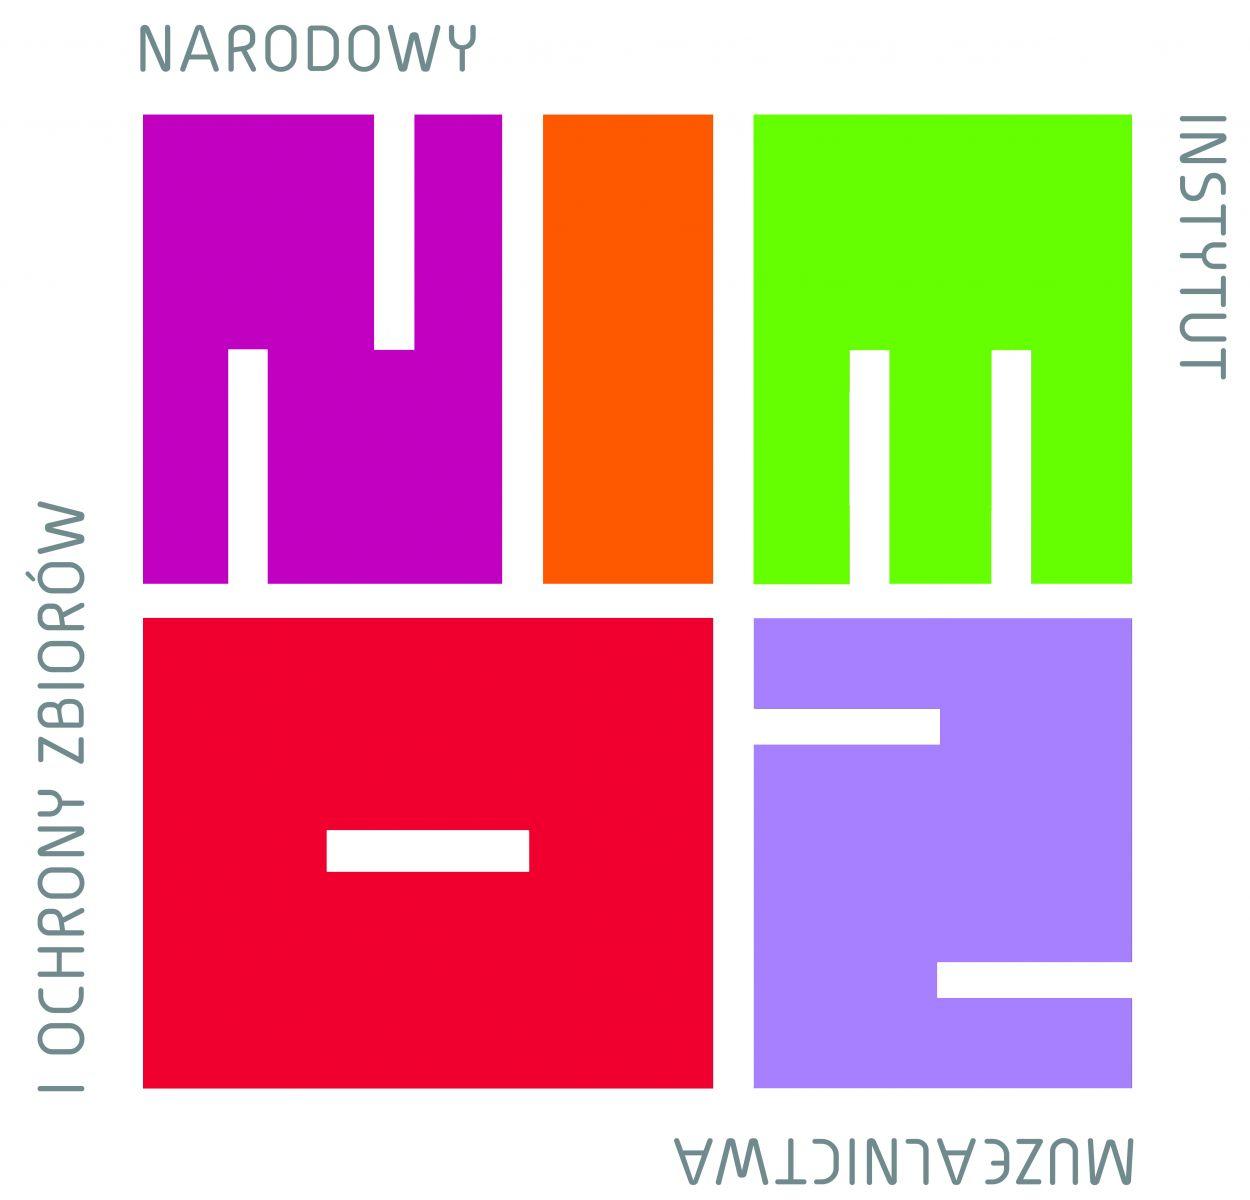 https://m.wmwm.pl/2019/10/orig/logo-nimoz-6514.jpg